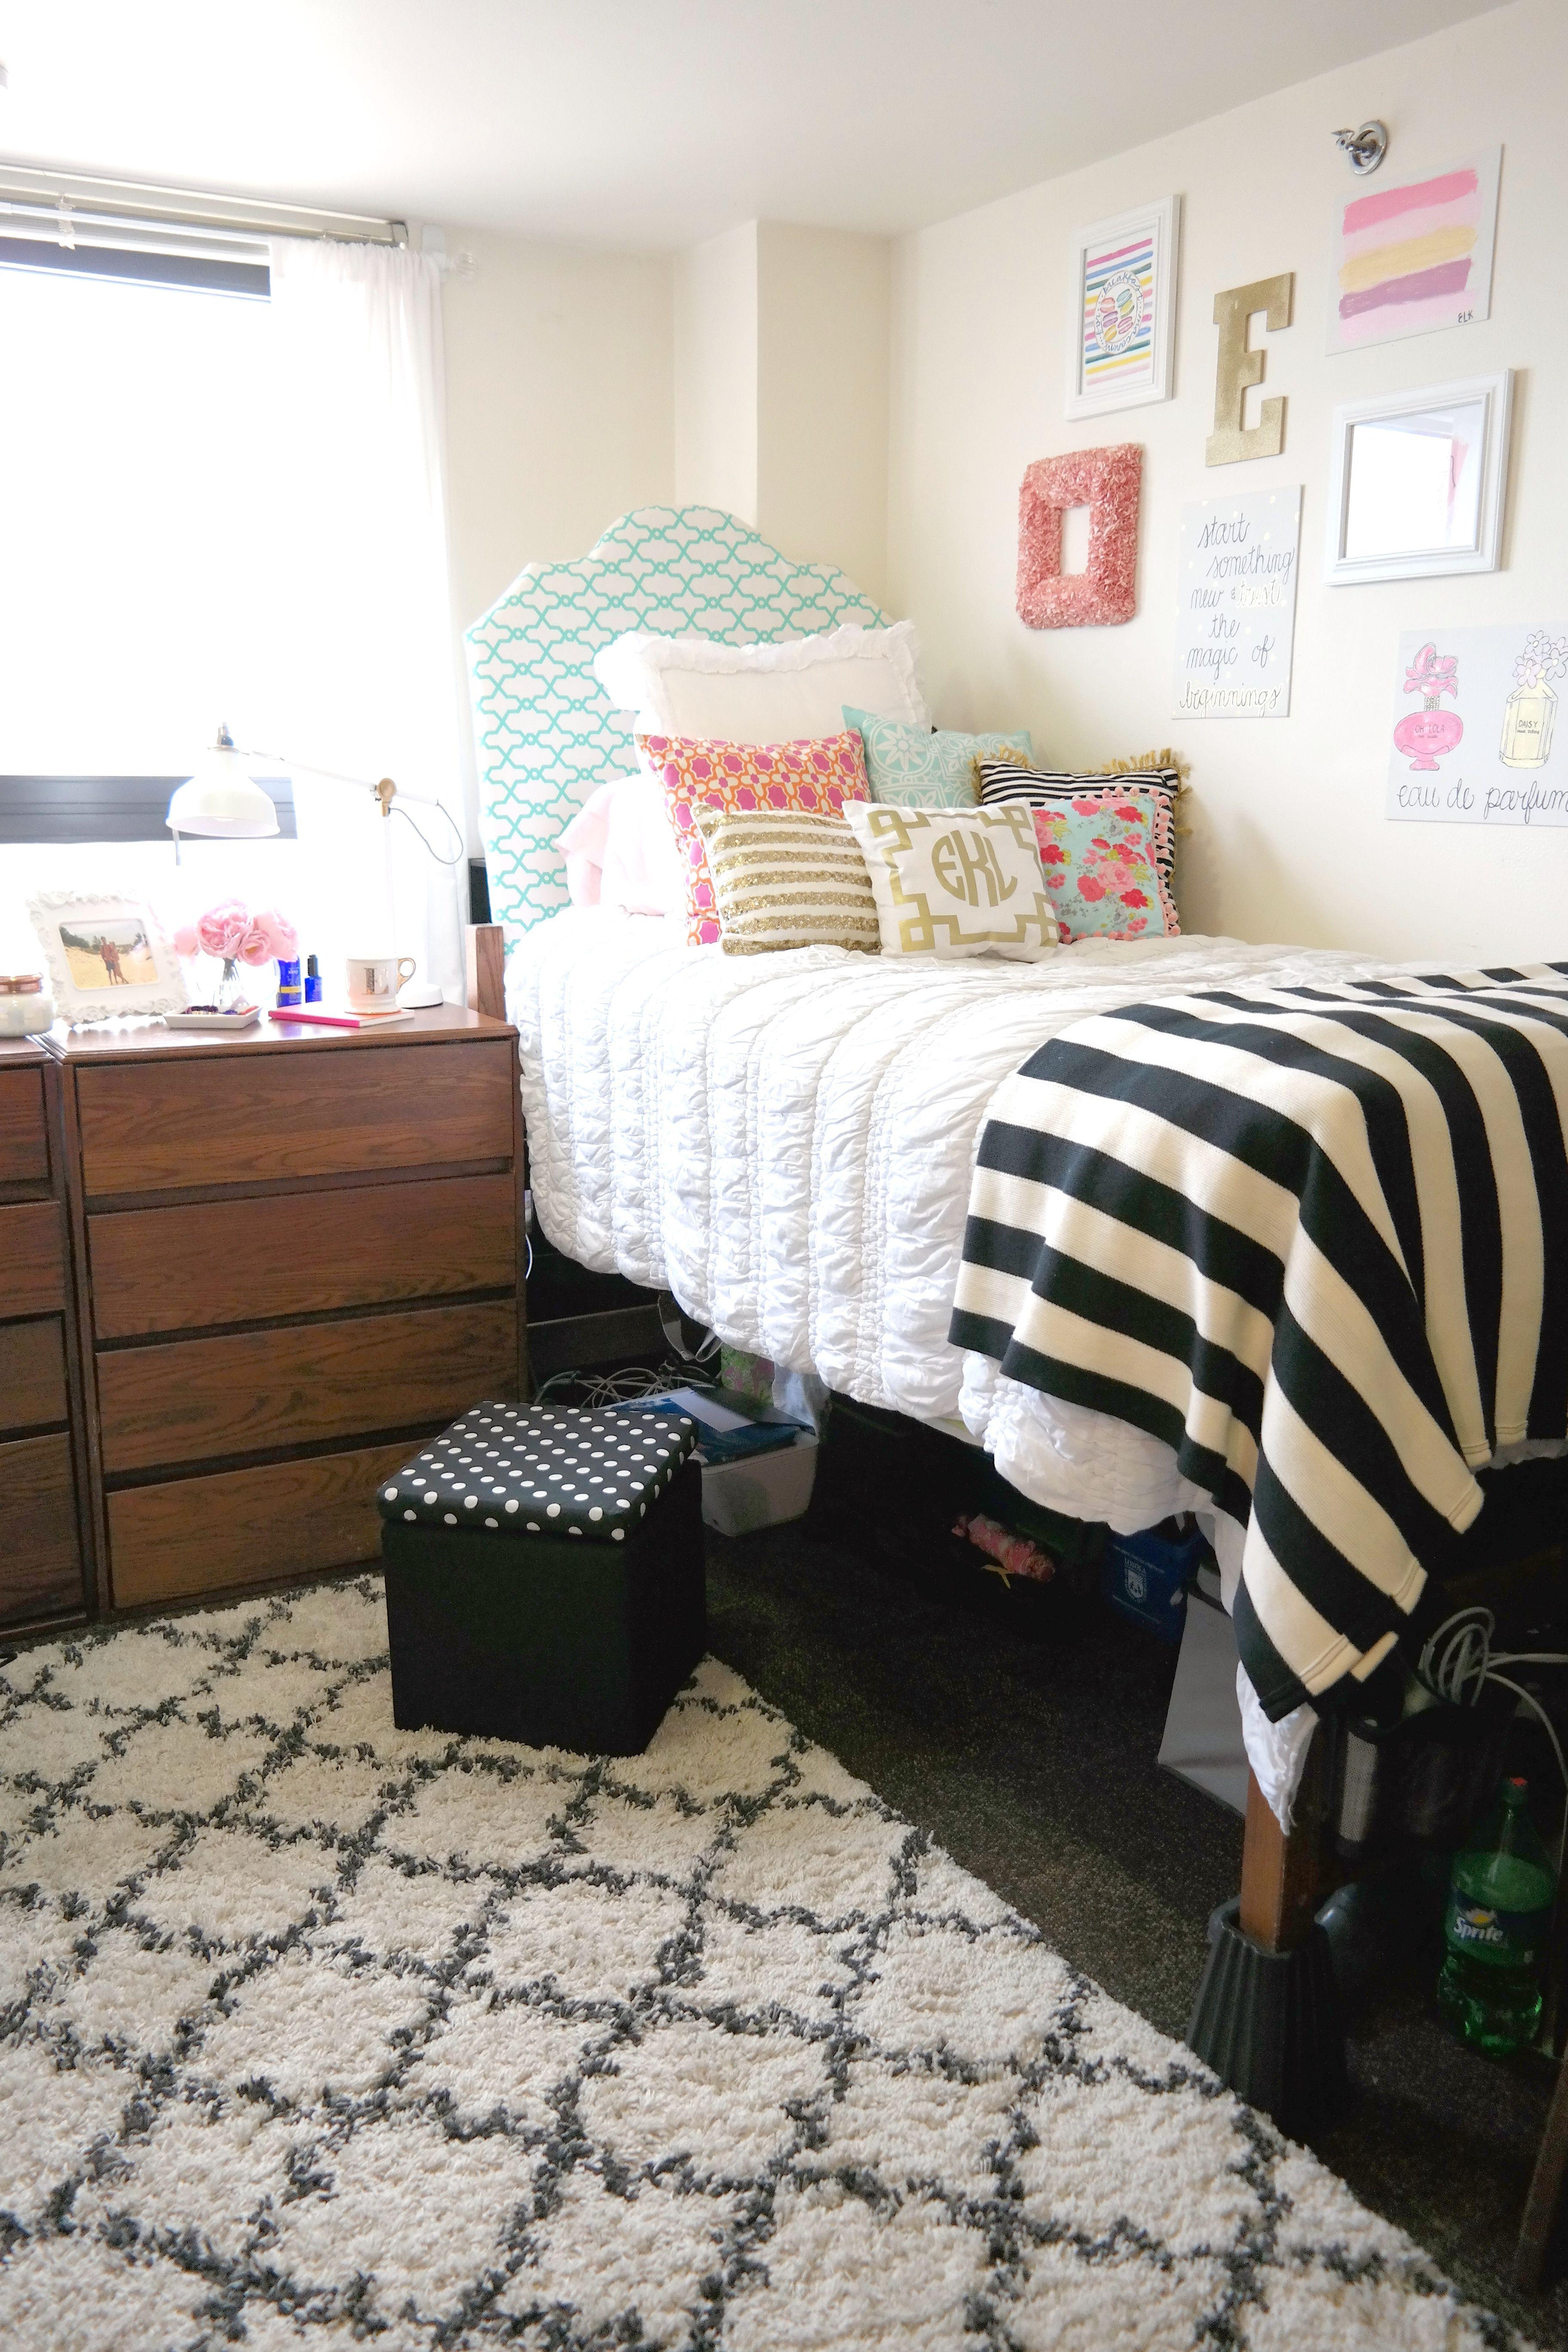 My Freshman Dorm Room Preppy Dorm Room Dorm Room Inspiration Dorm Room Organization